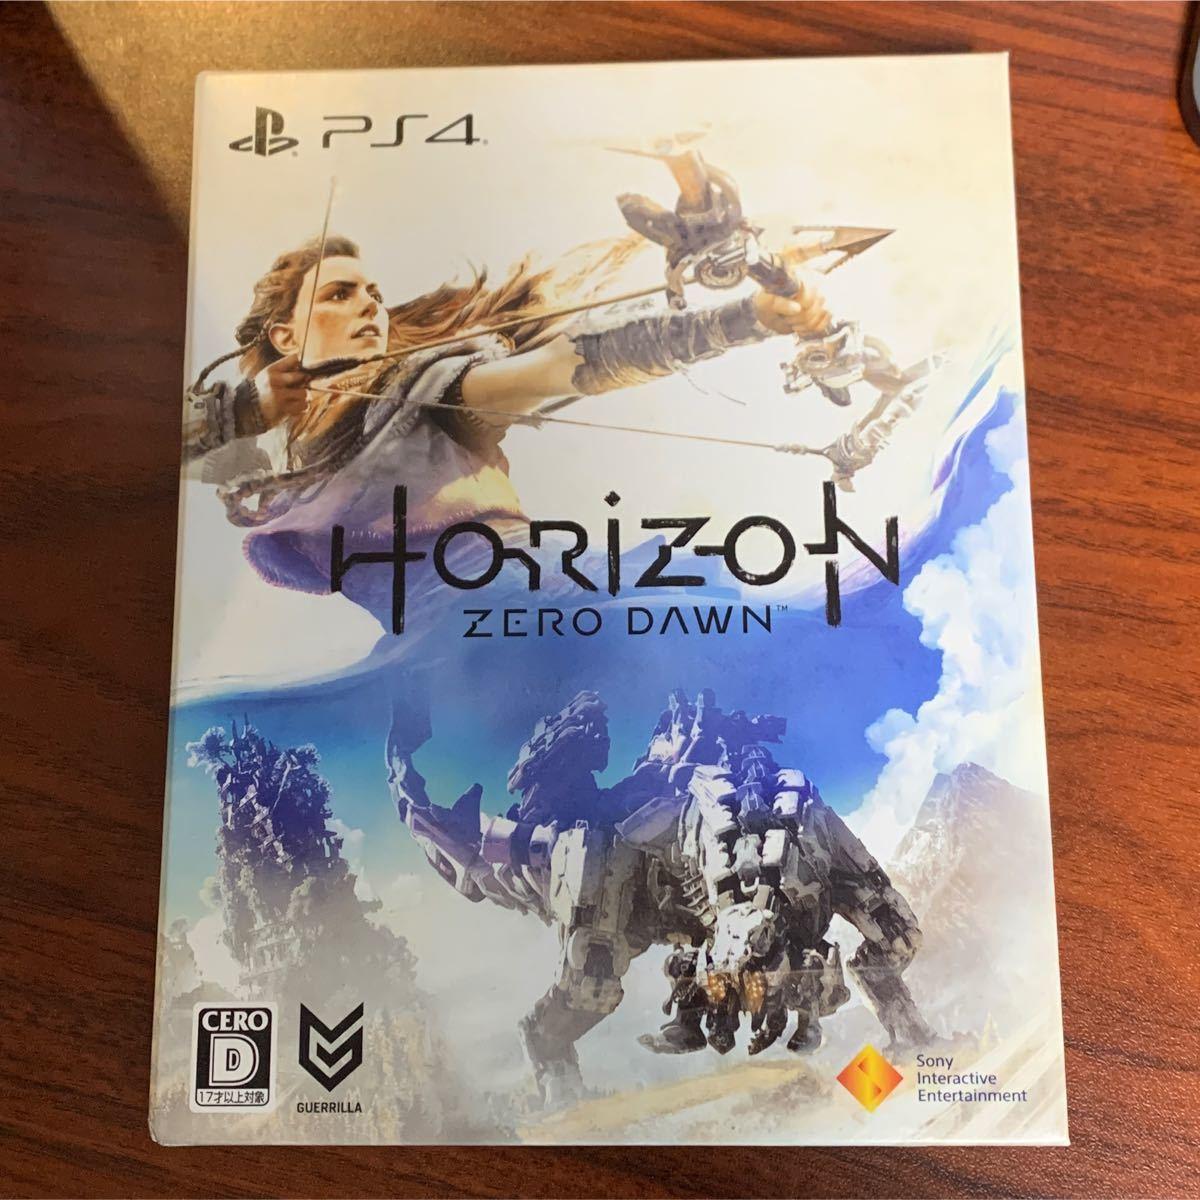 Horizon Zero Dawn ホライゾンゼロドーン 初回限定版 PS4